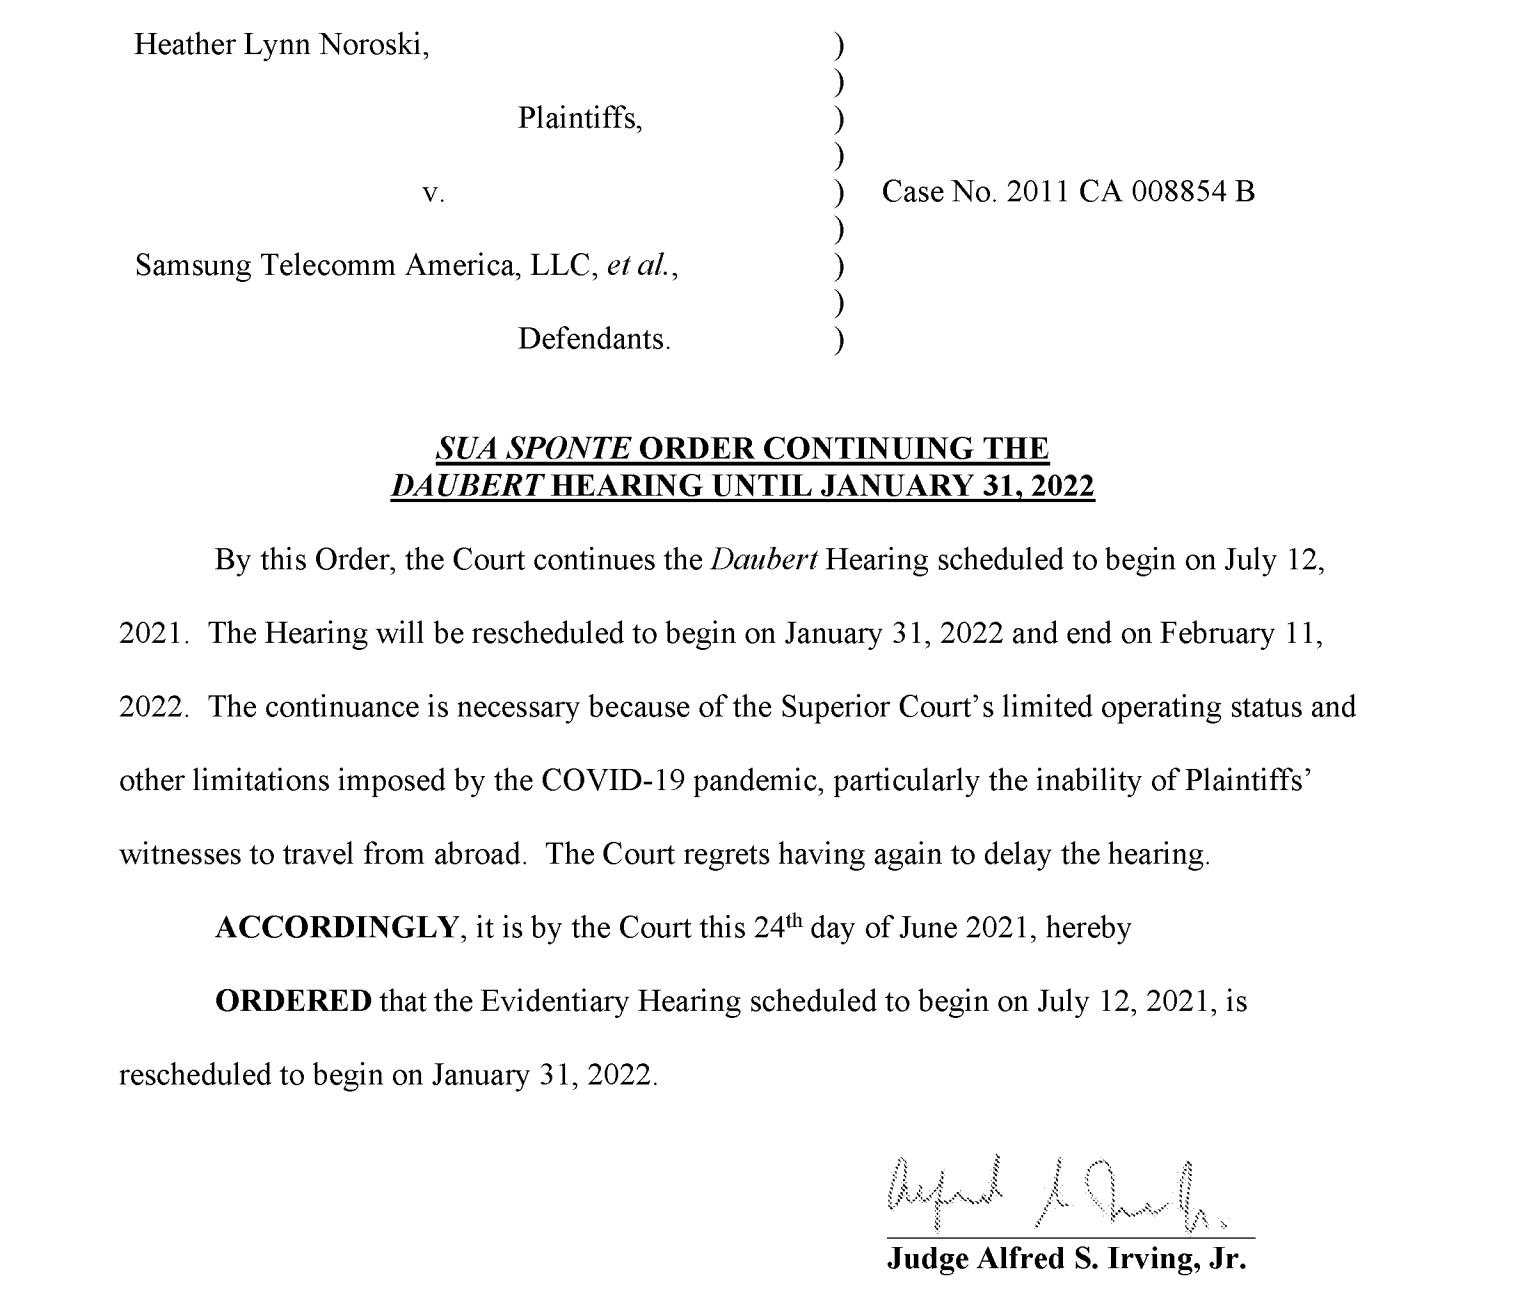 Judge Irving Daubert Delay Order